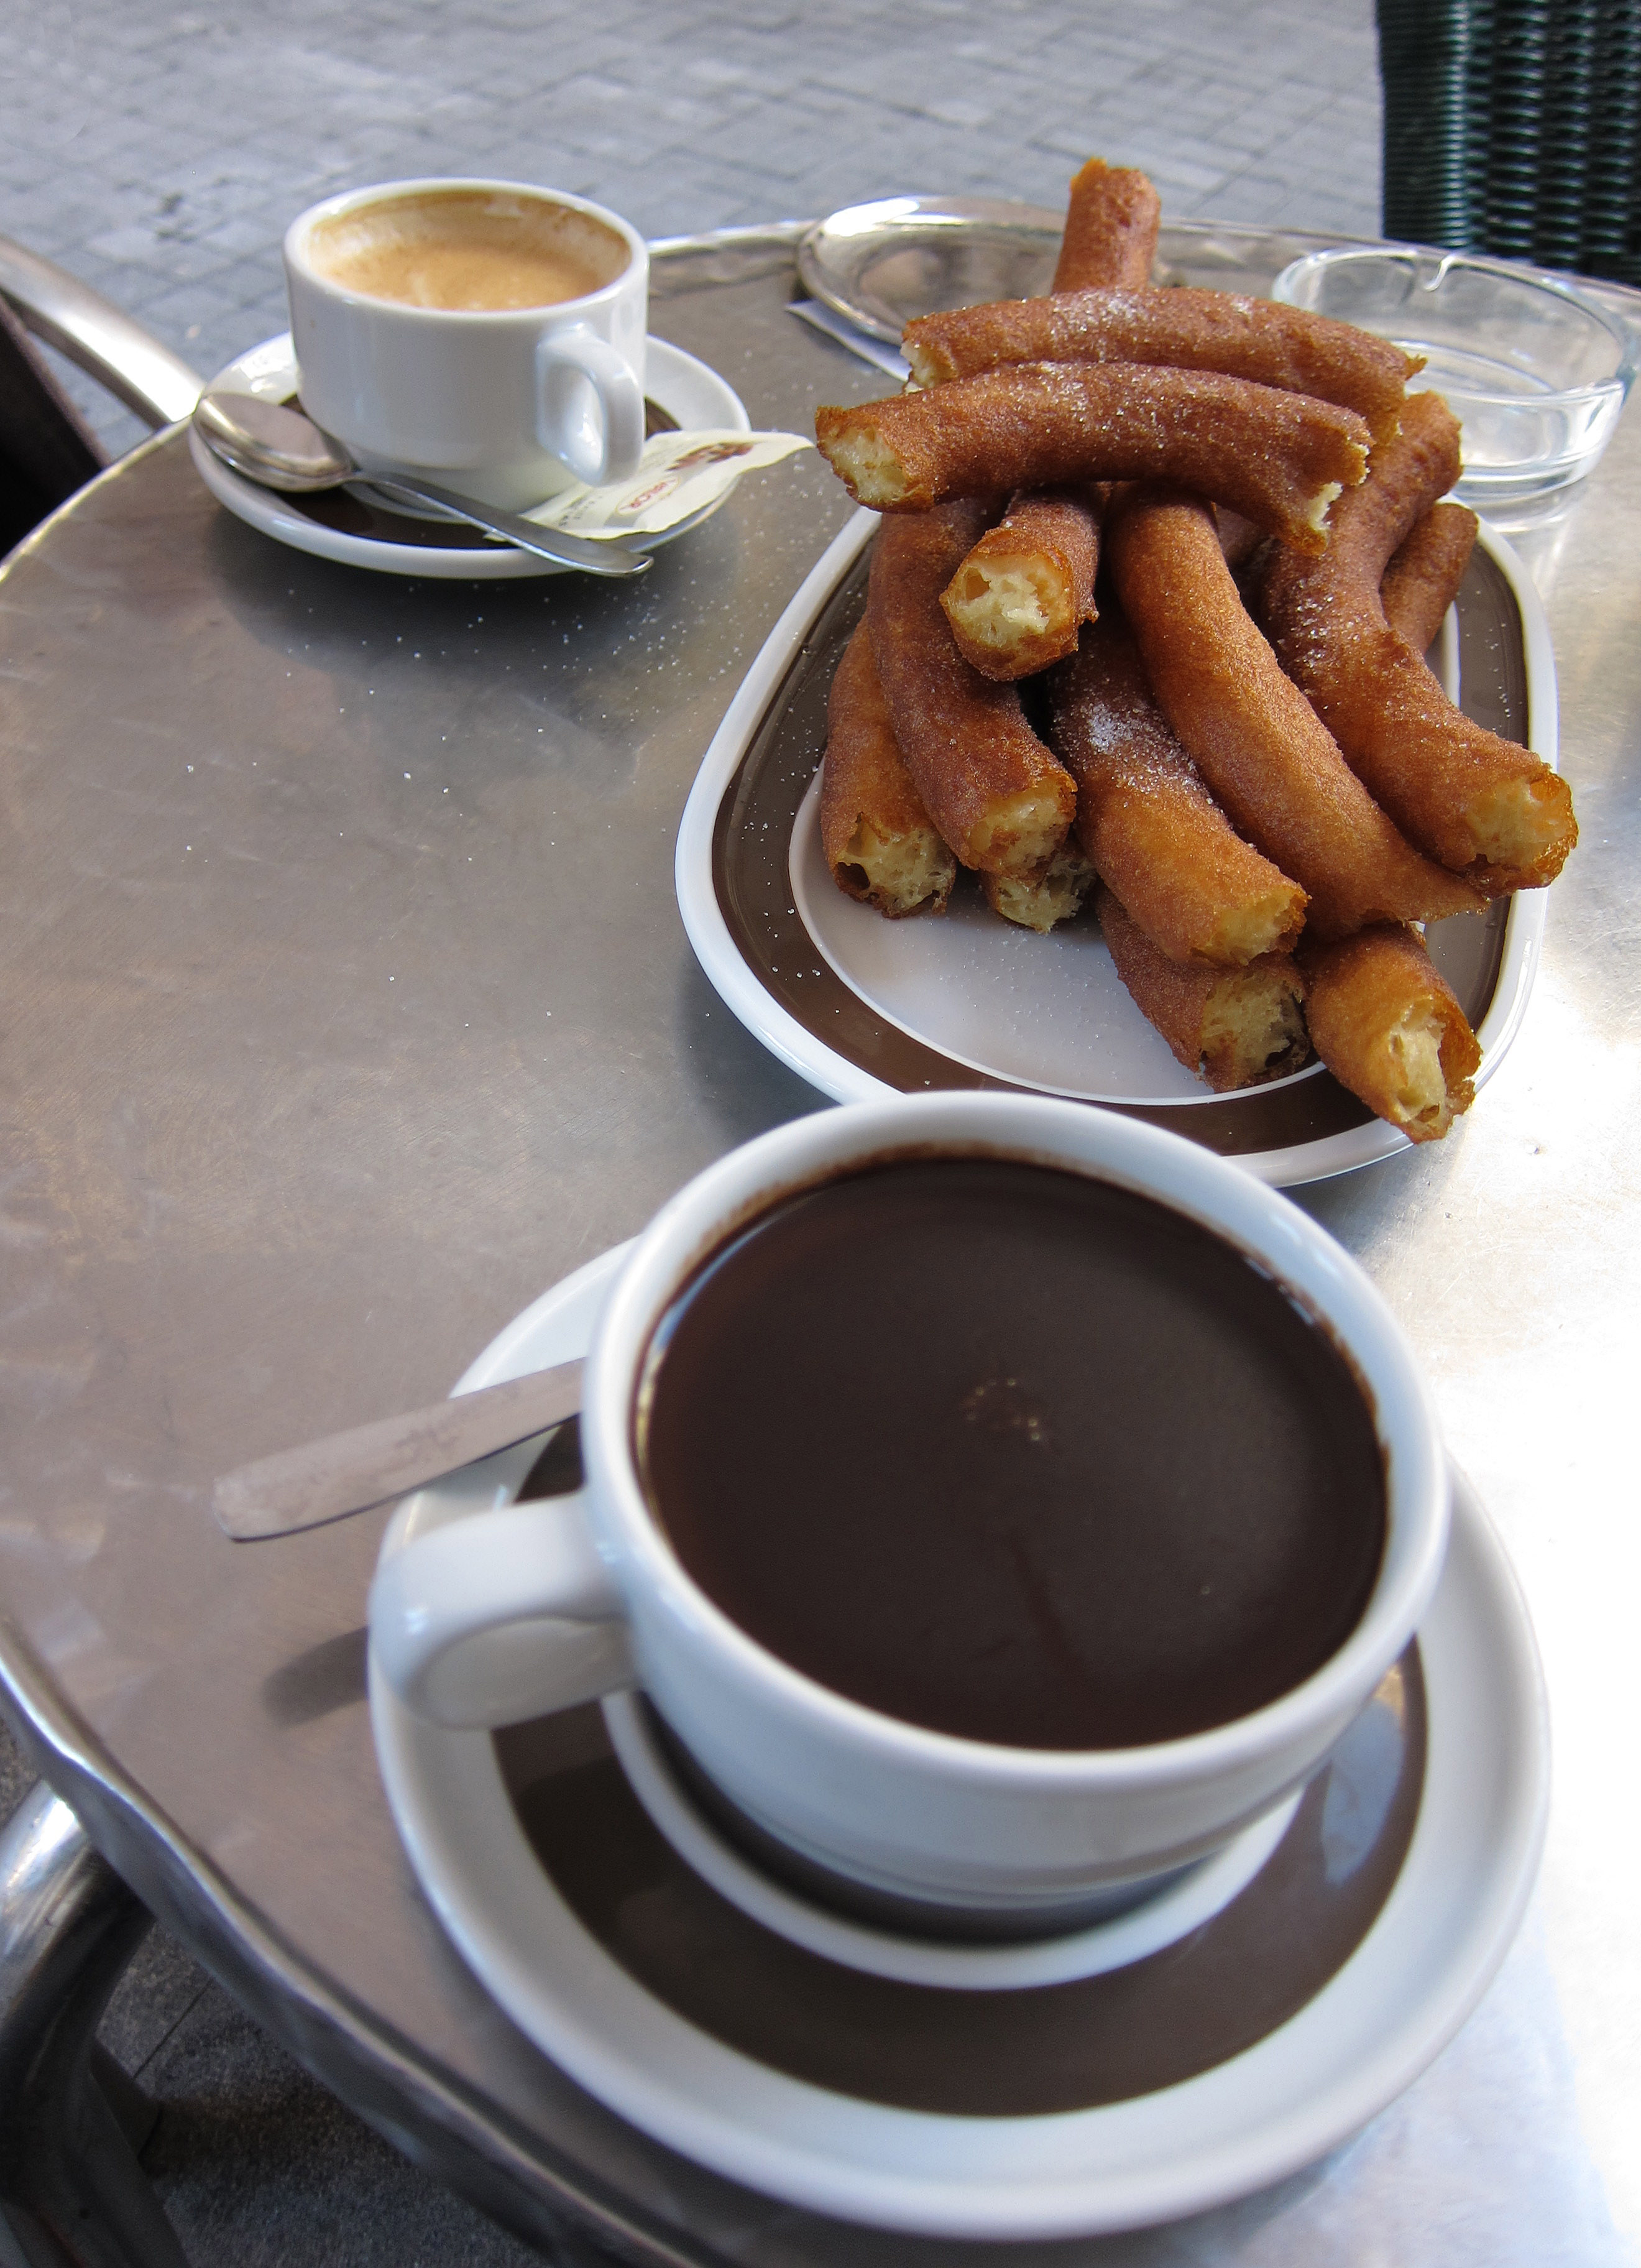 File:Chocolate, churros y café.jpg - Wikimedia Commons